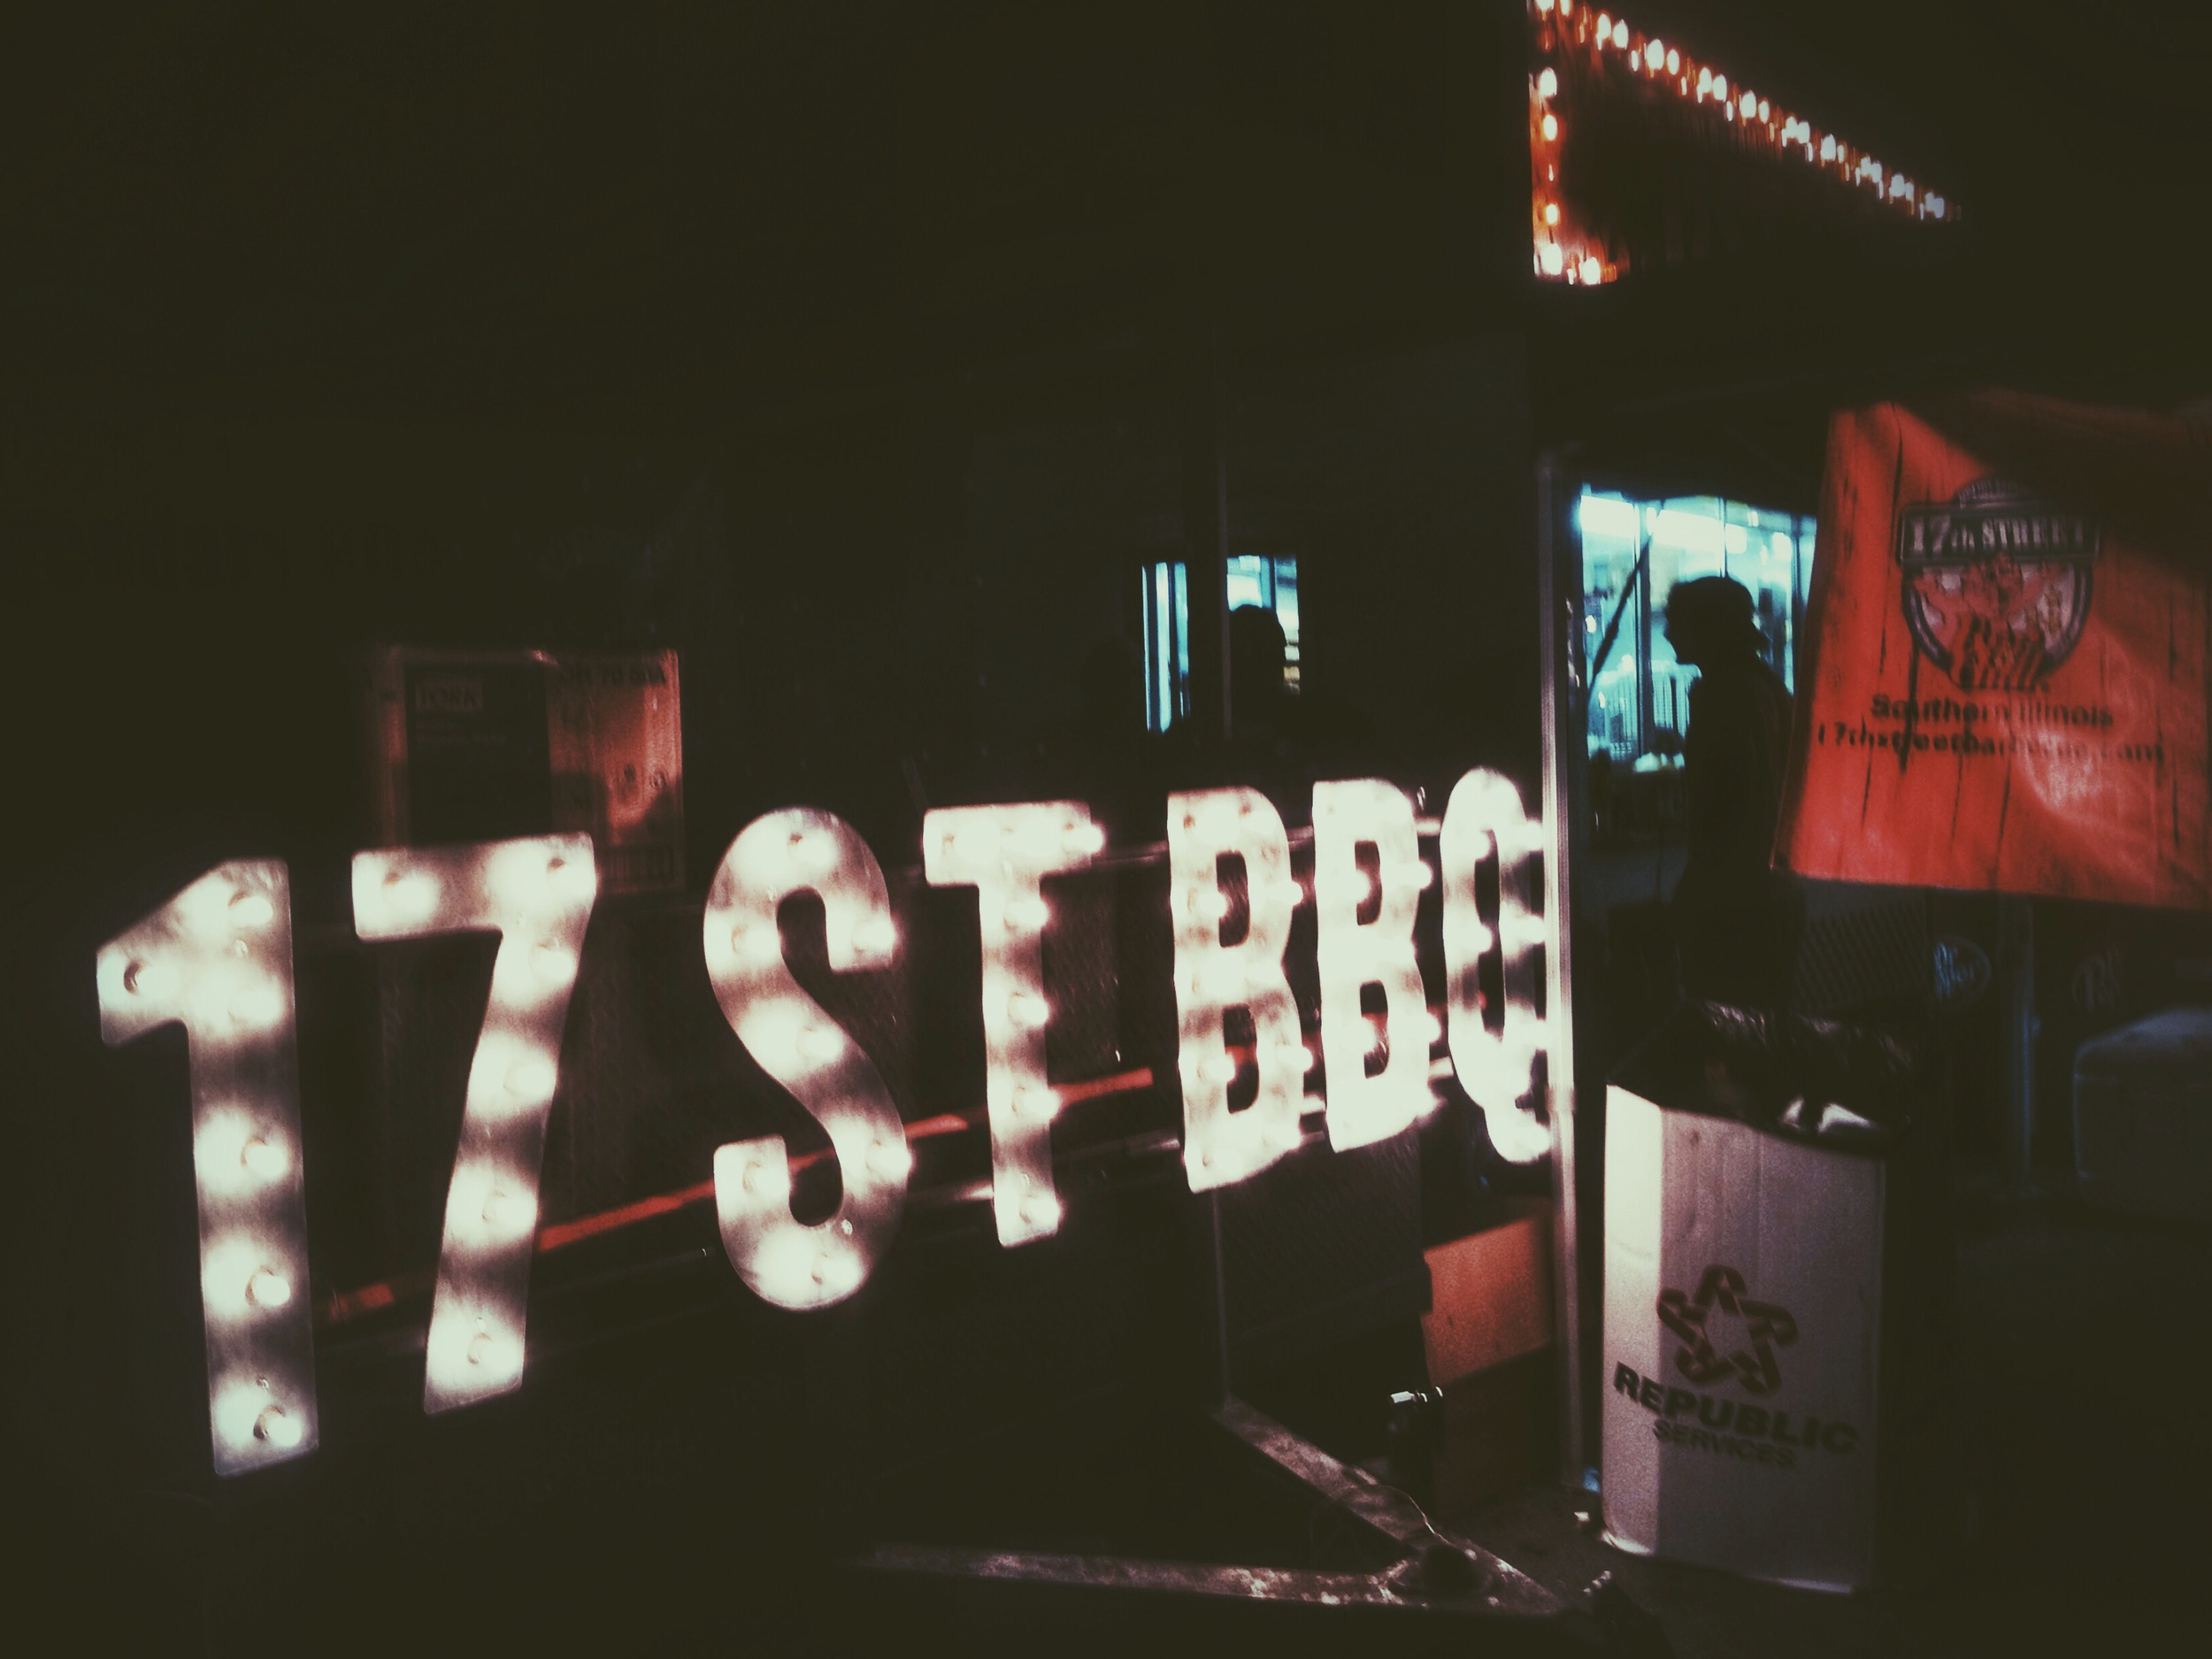 Pitmaster Mike Mills' 17th Street BBQ Signage, representing Murphysboro, Illinois